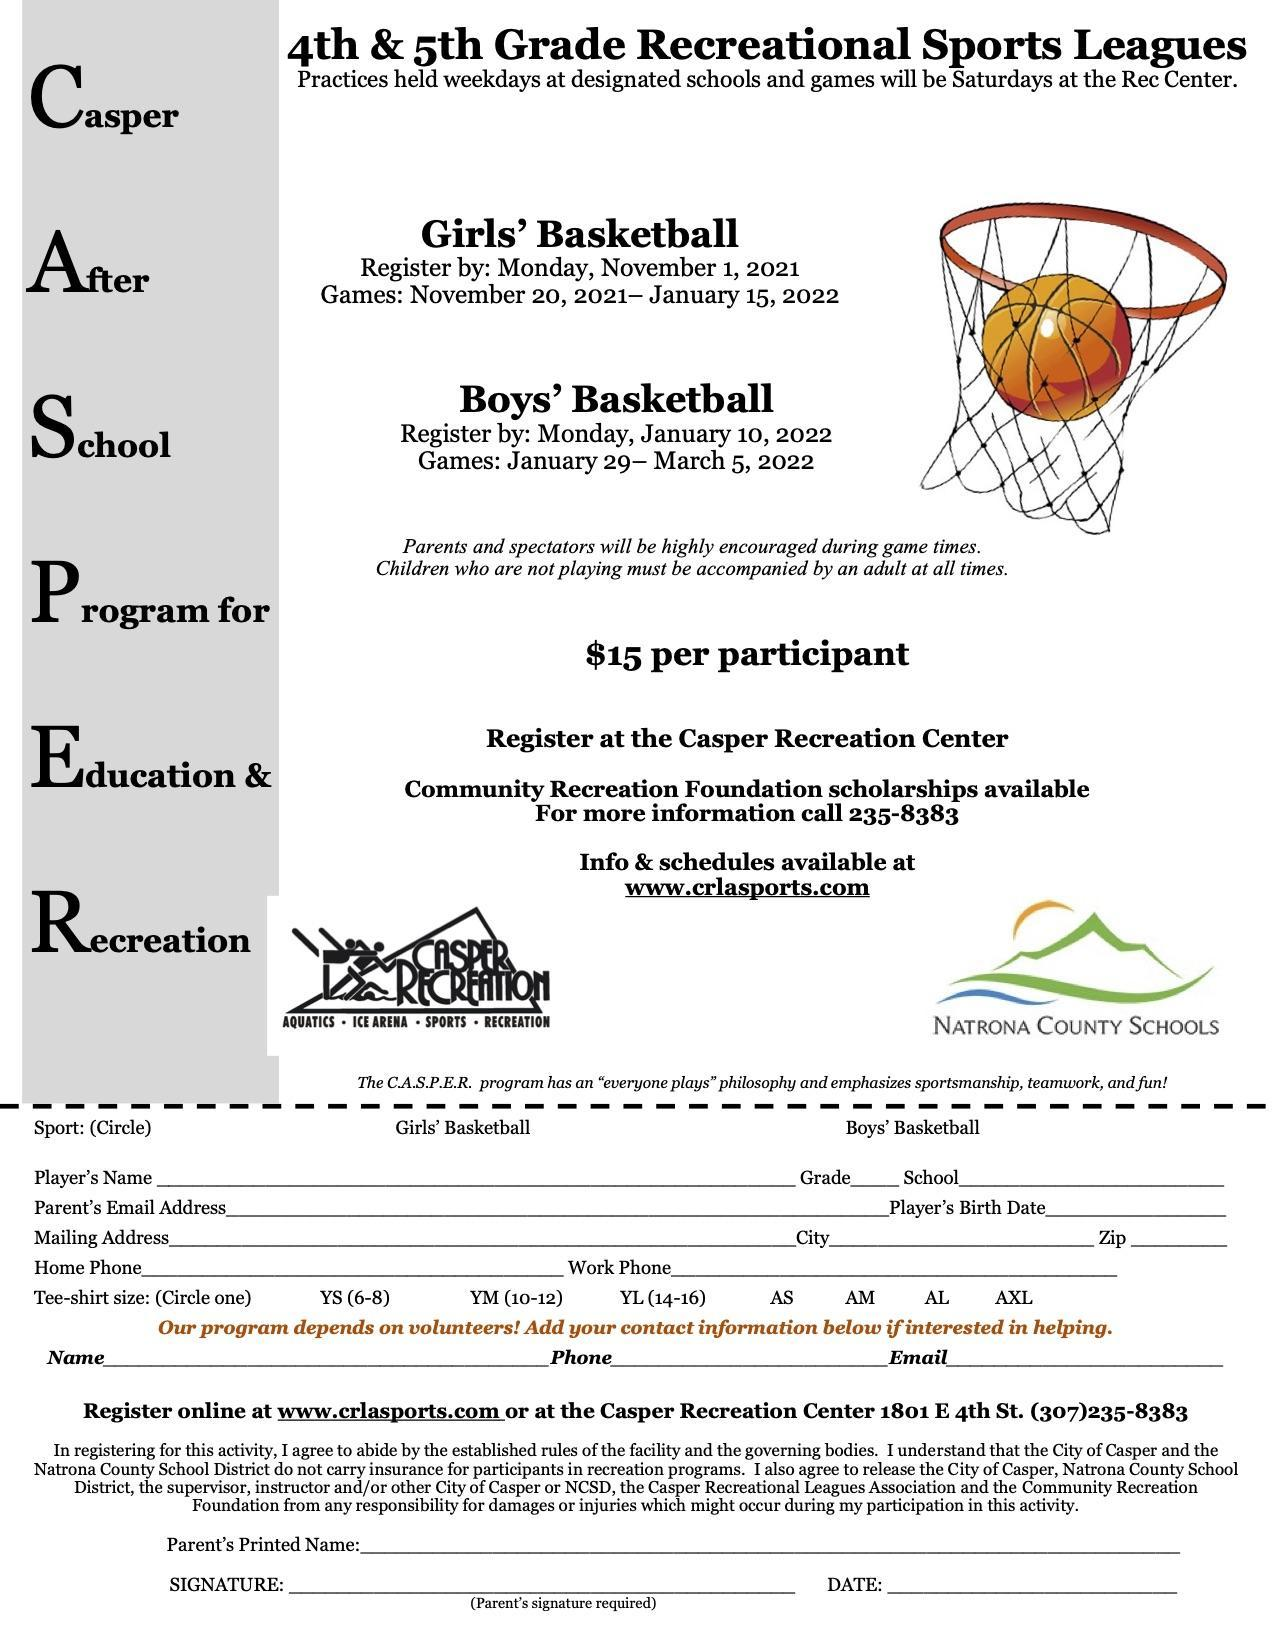 4th & 5th Grade Basketball flyer